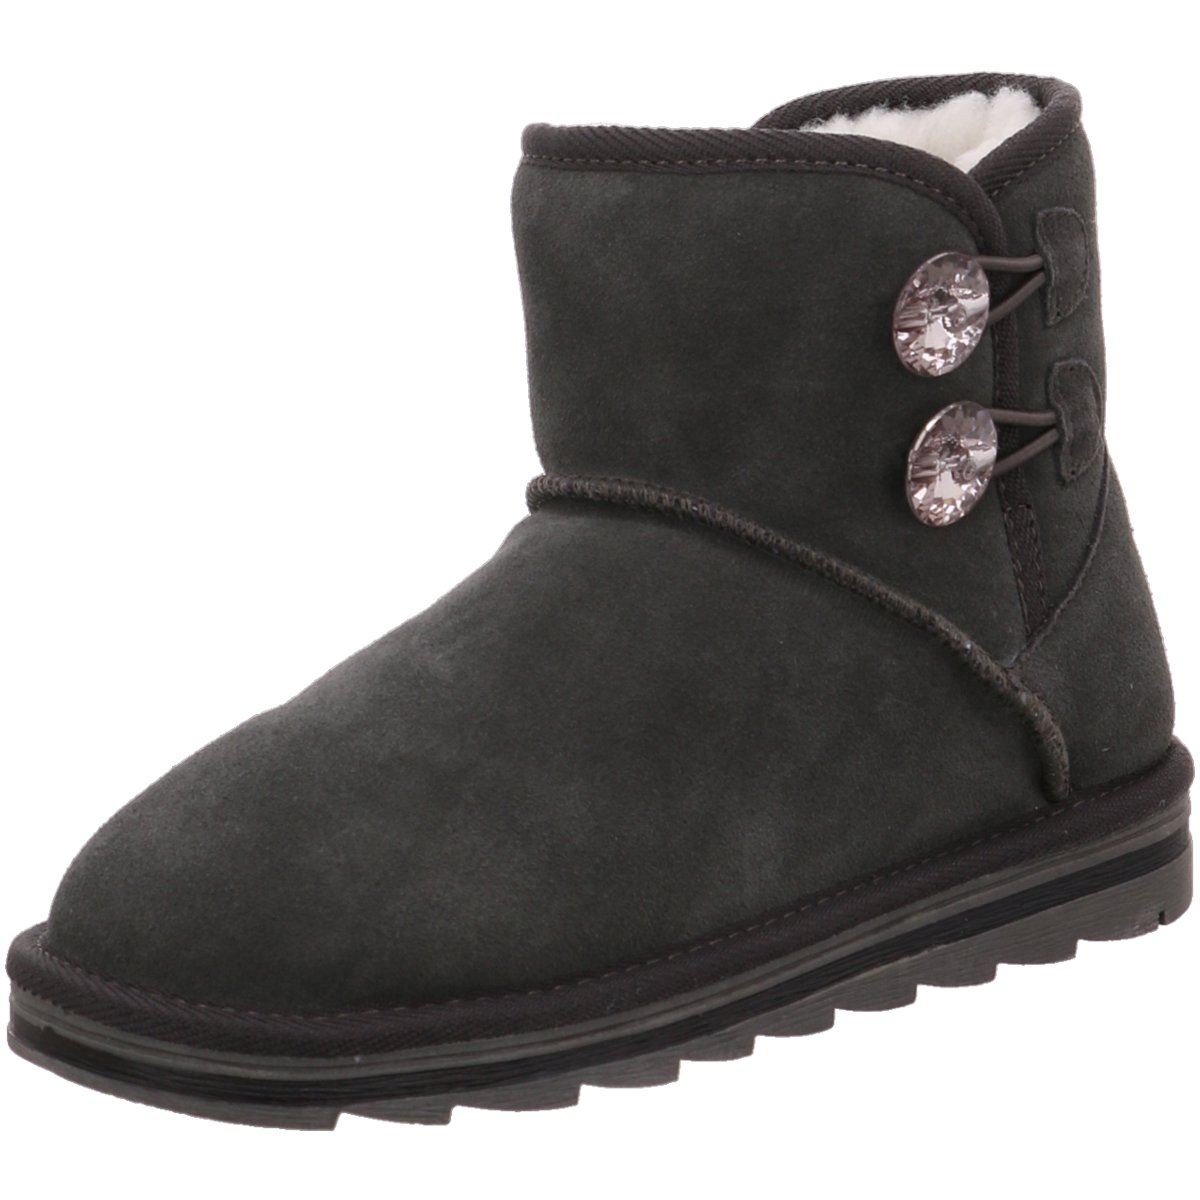 e4aaac978a998c NIB NIB NIB Nike Jordan Future boot size 9.5 maroon infrared 854554 600  de09d1